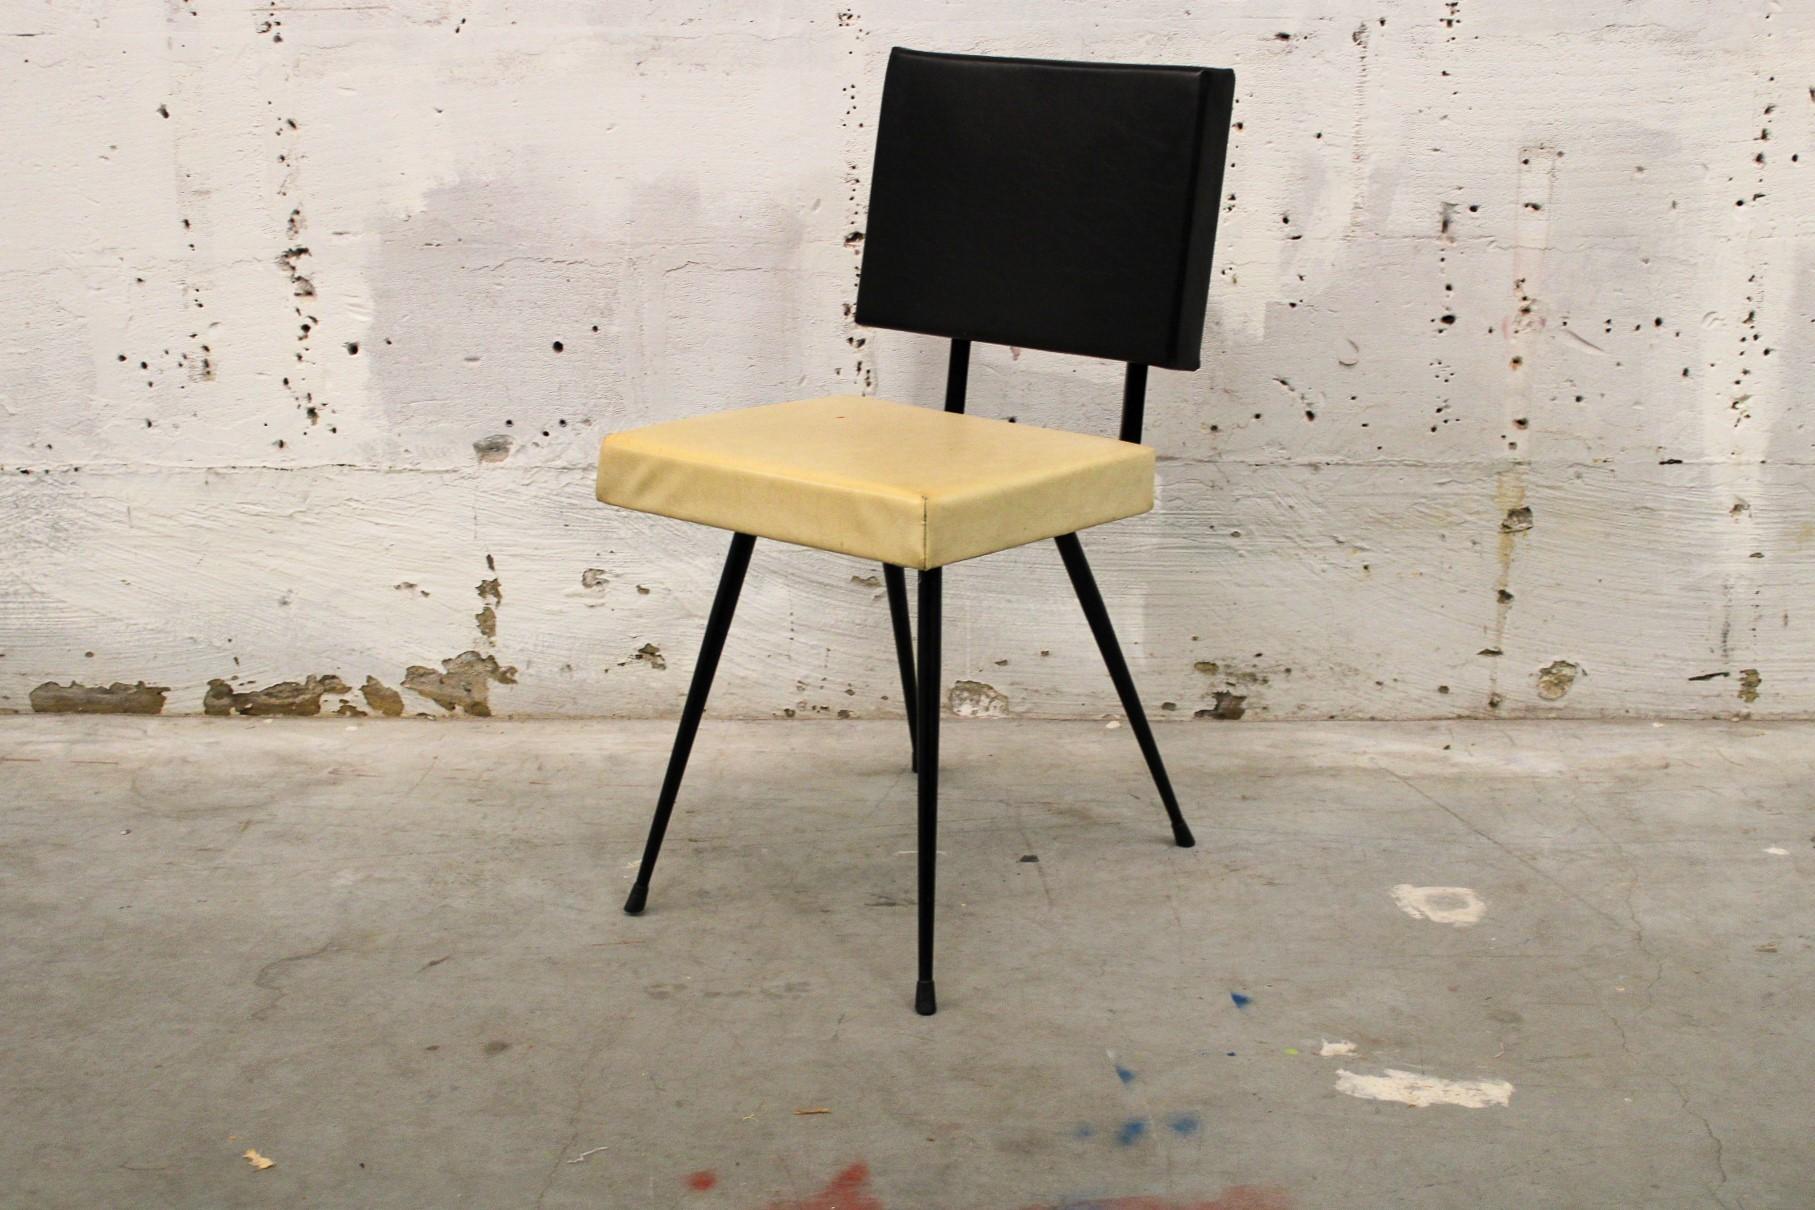 brabantia chair whit/black